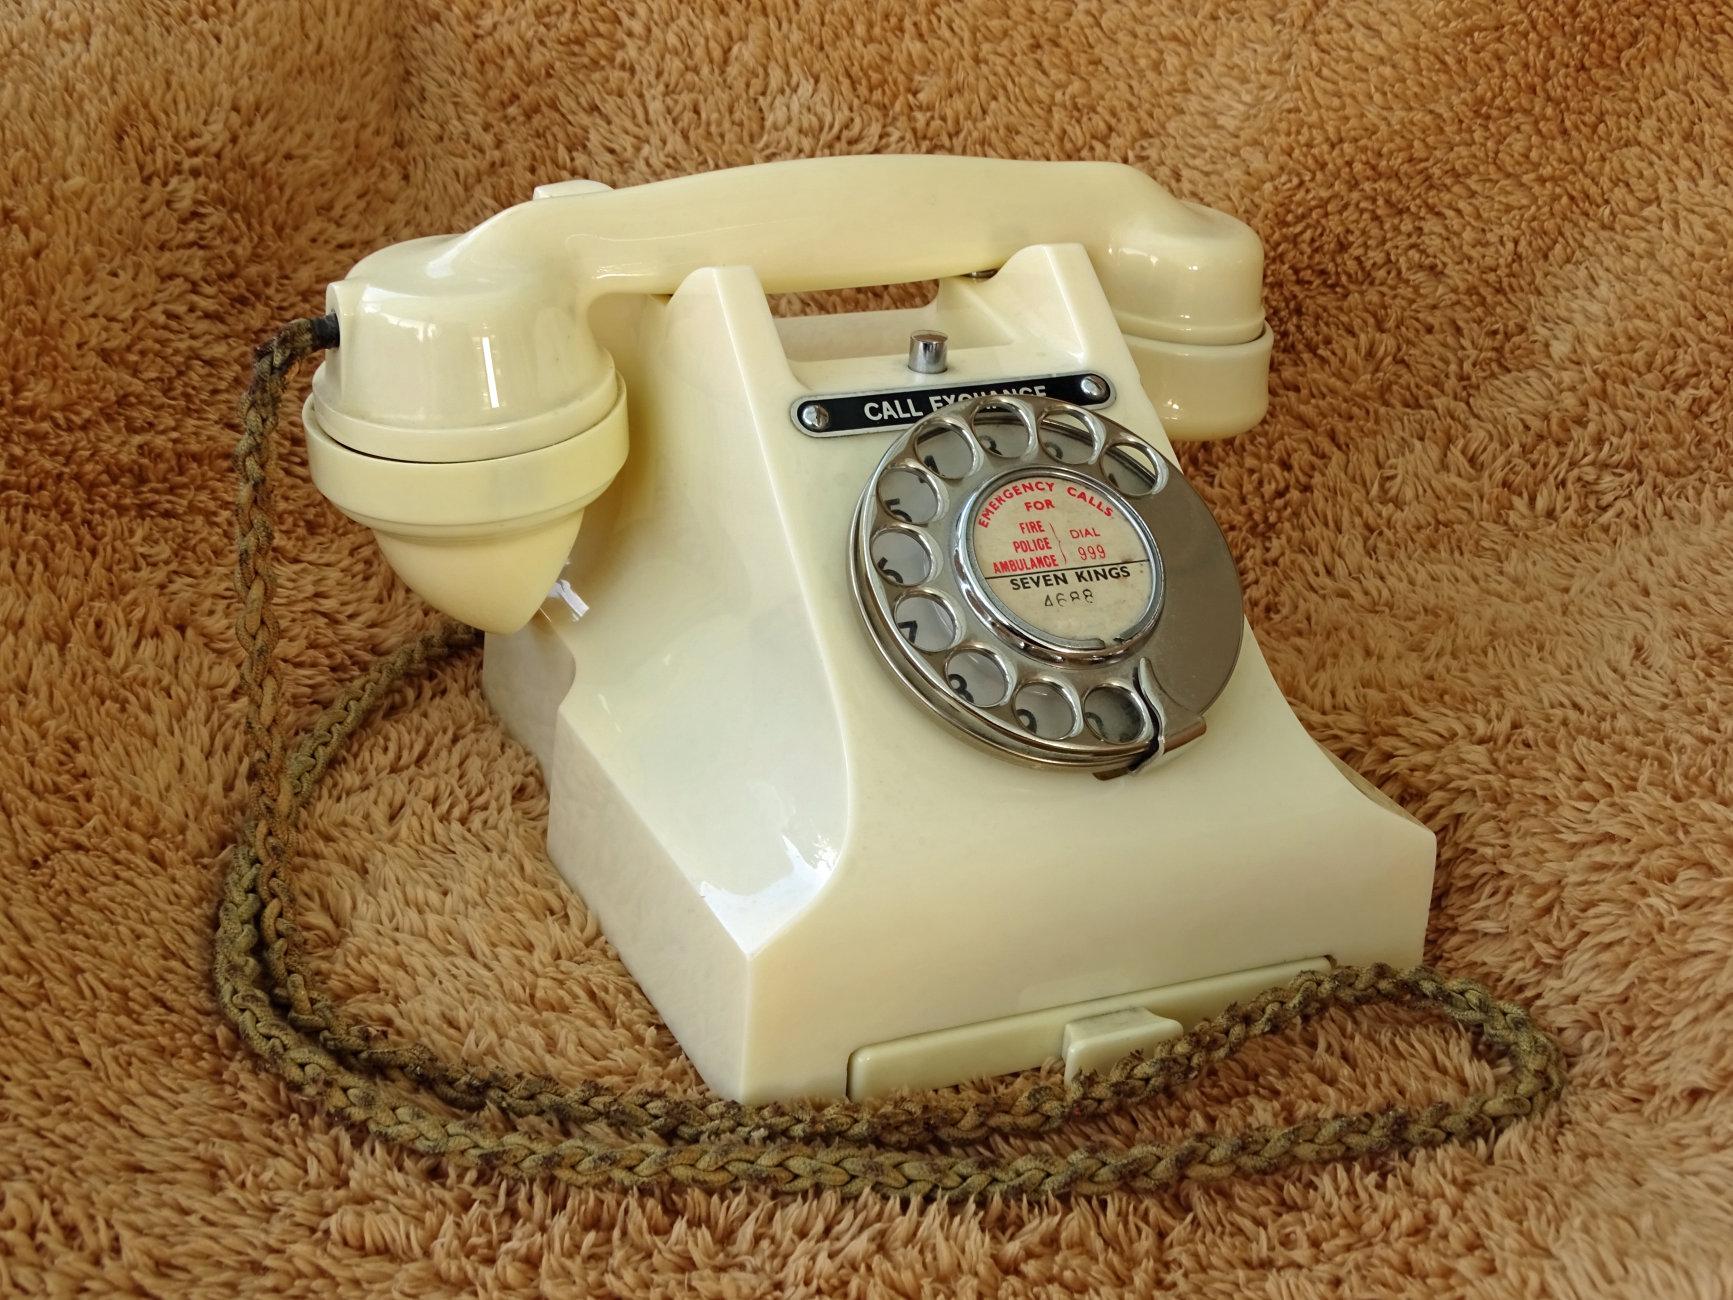 1950 300 series GPO Telephone